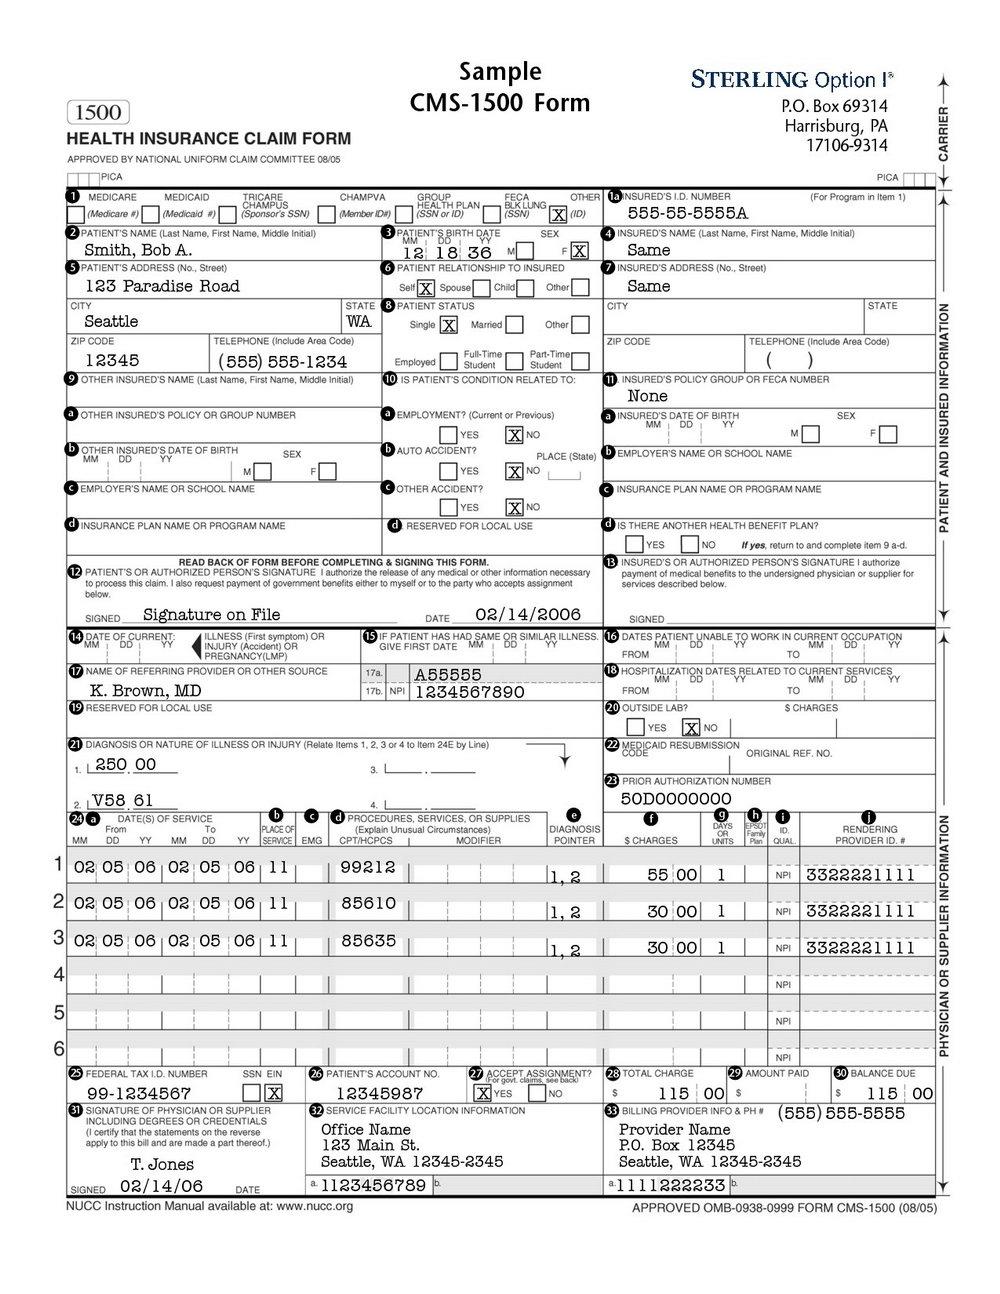 Cms 1500 Form Pdf Download